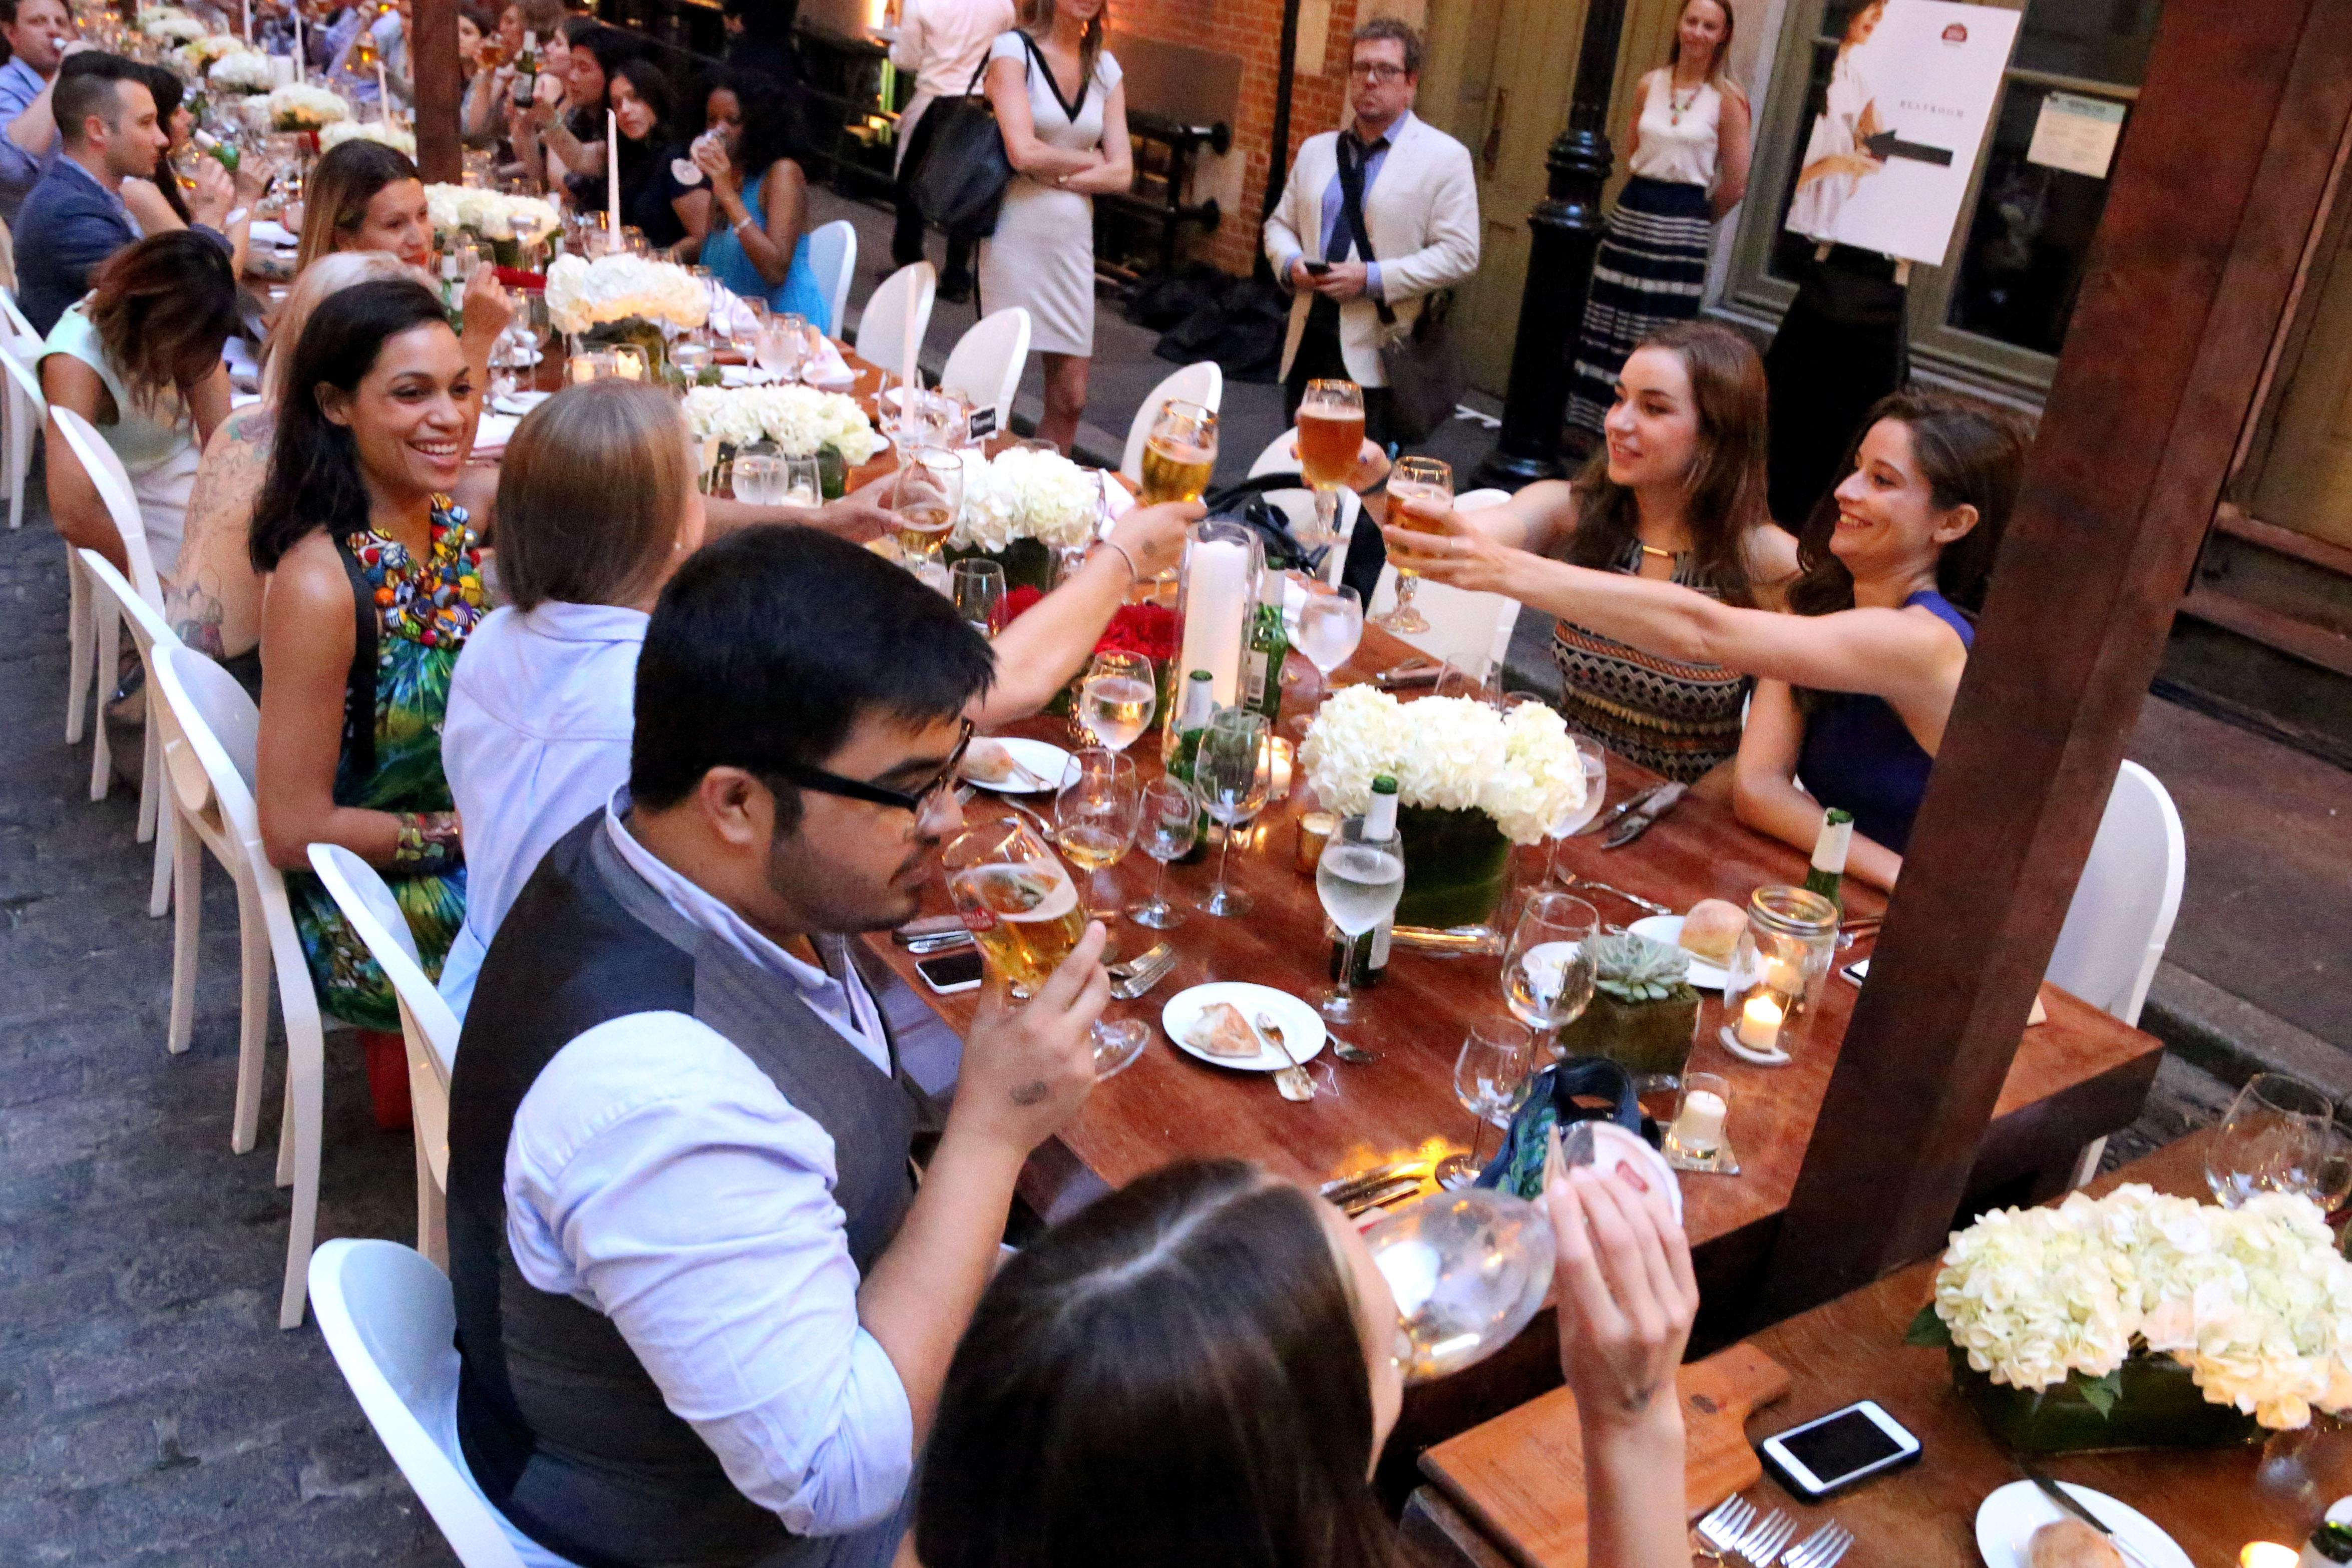 Beer drinkers at Financier Patisserie in New York City on July 21, 2014.